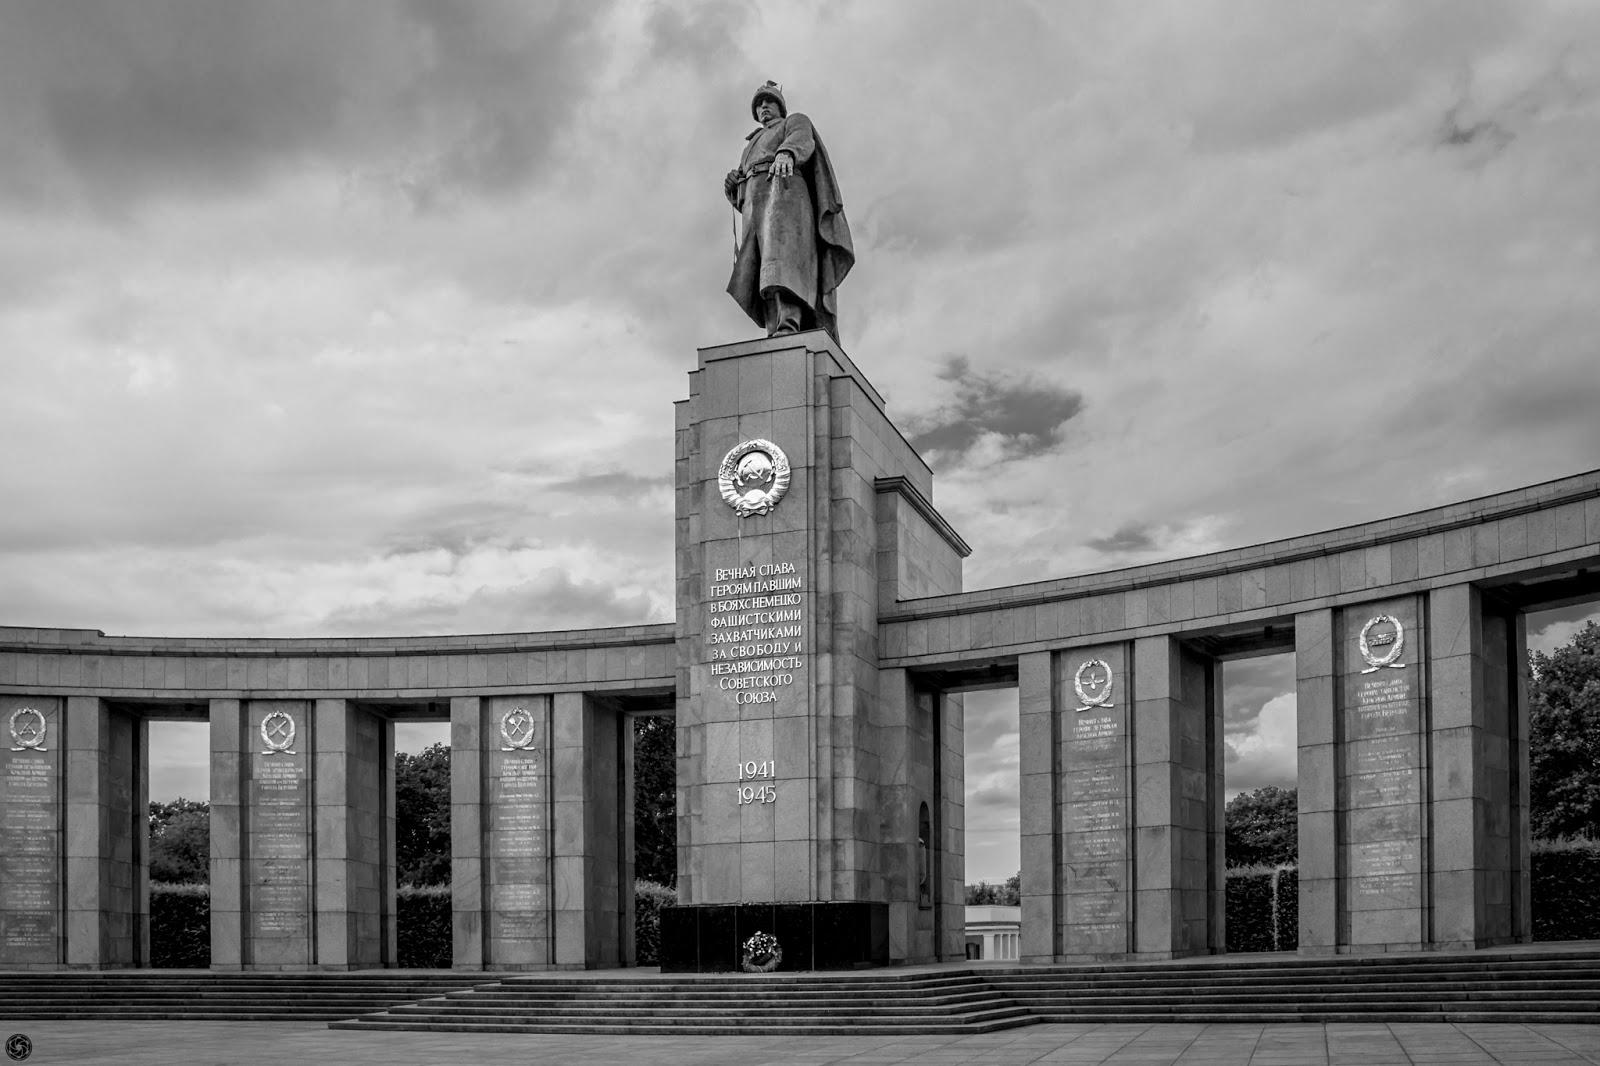 Subyugación del fascismo, 2014 :: Canon EOS5D MkIII | ISO100 | Canon24-105 @24mm | f/9.0 | 1/125s